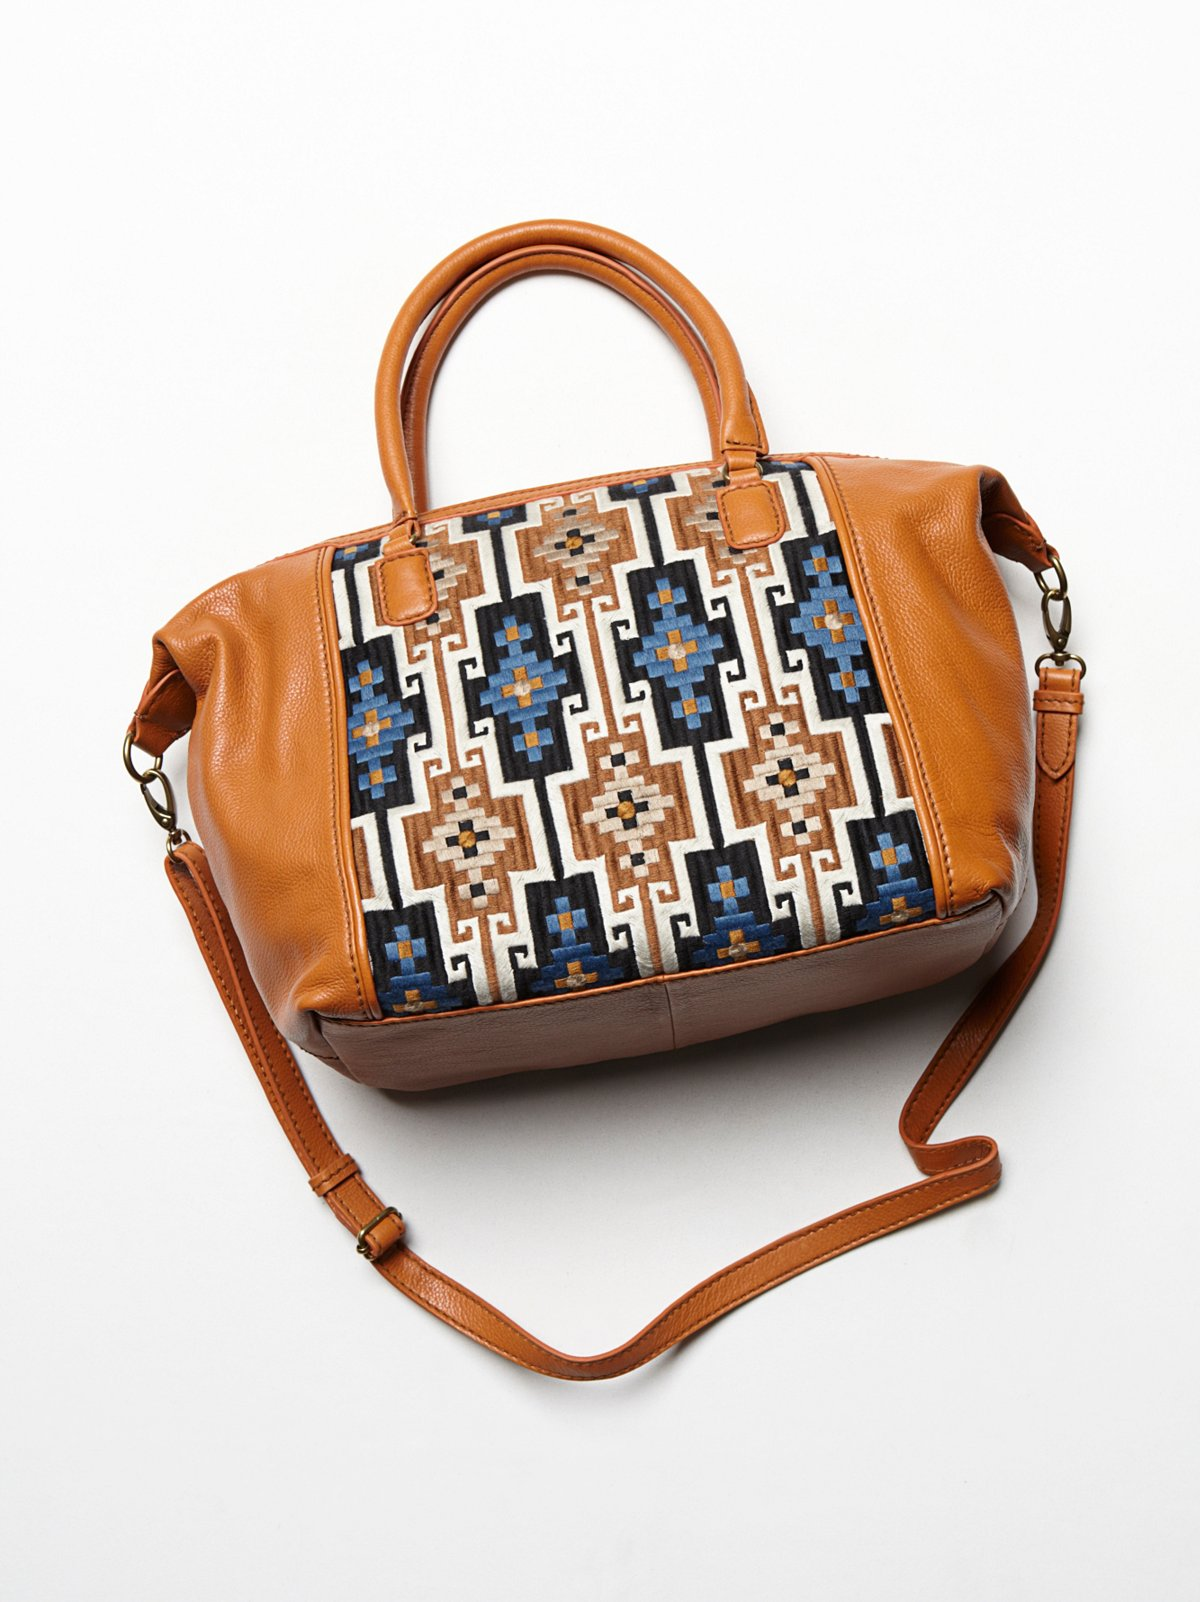 Lara Embriodered Bag